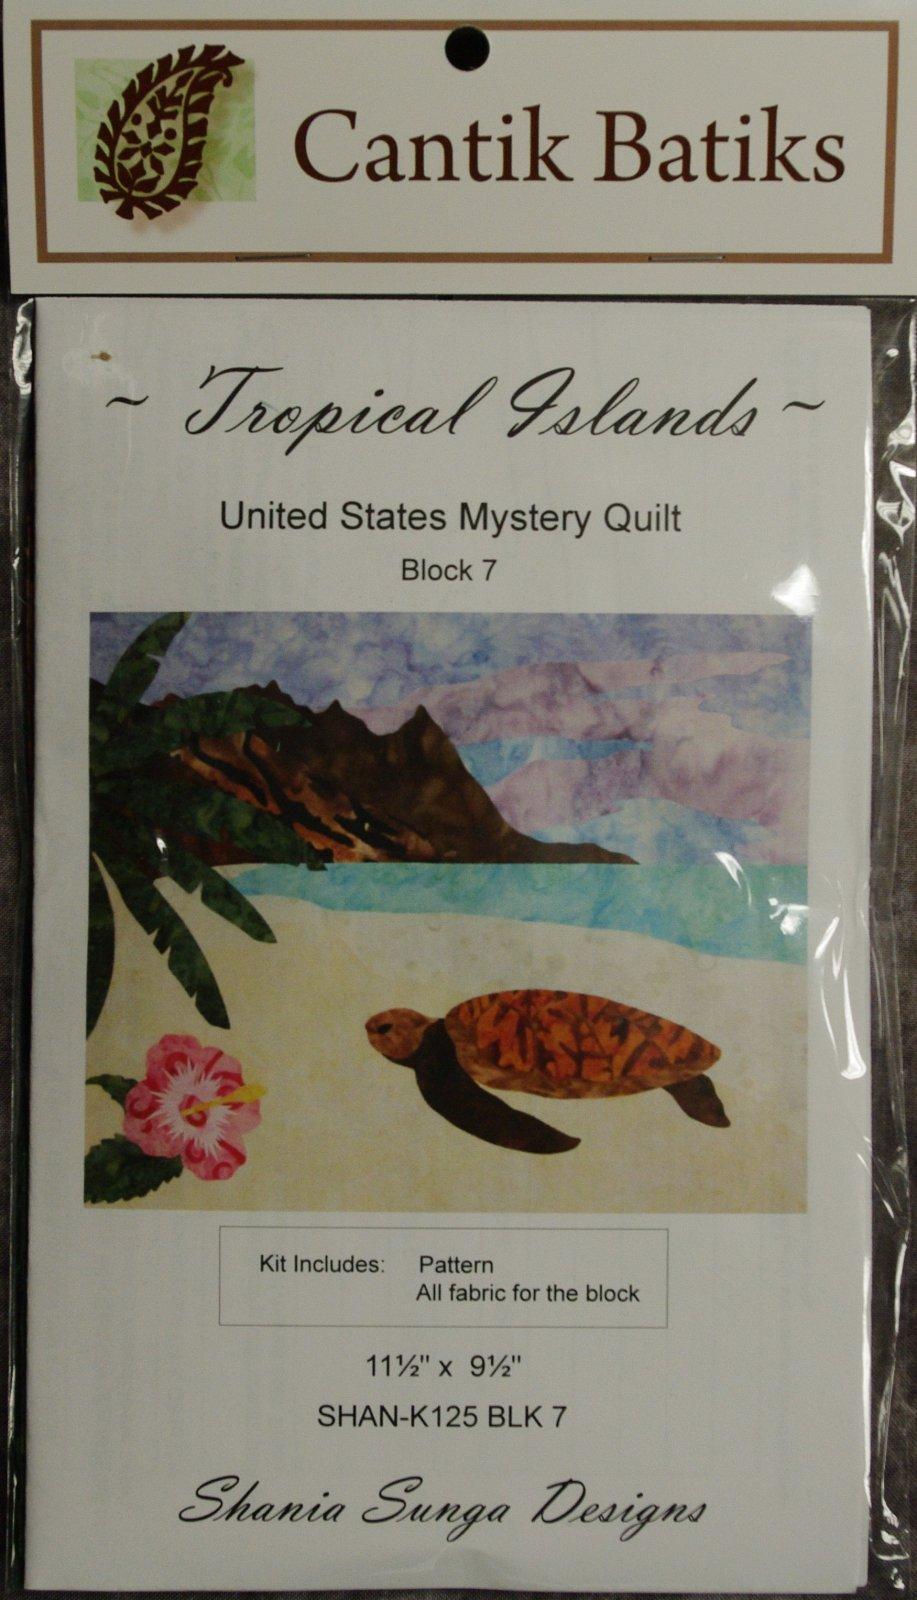 Cantik Batiks United States Mystery Quilt - Tropical Island - Block 7 Kit